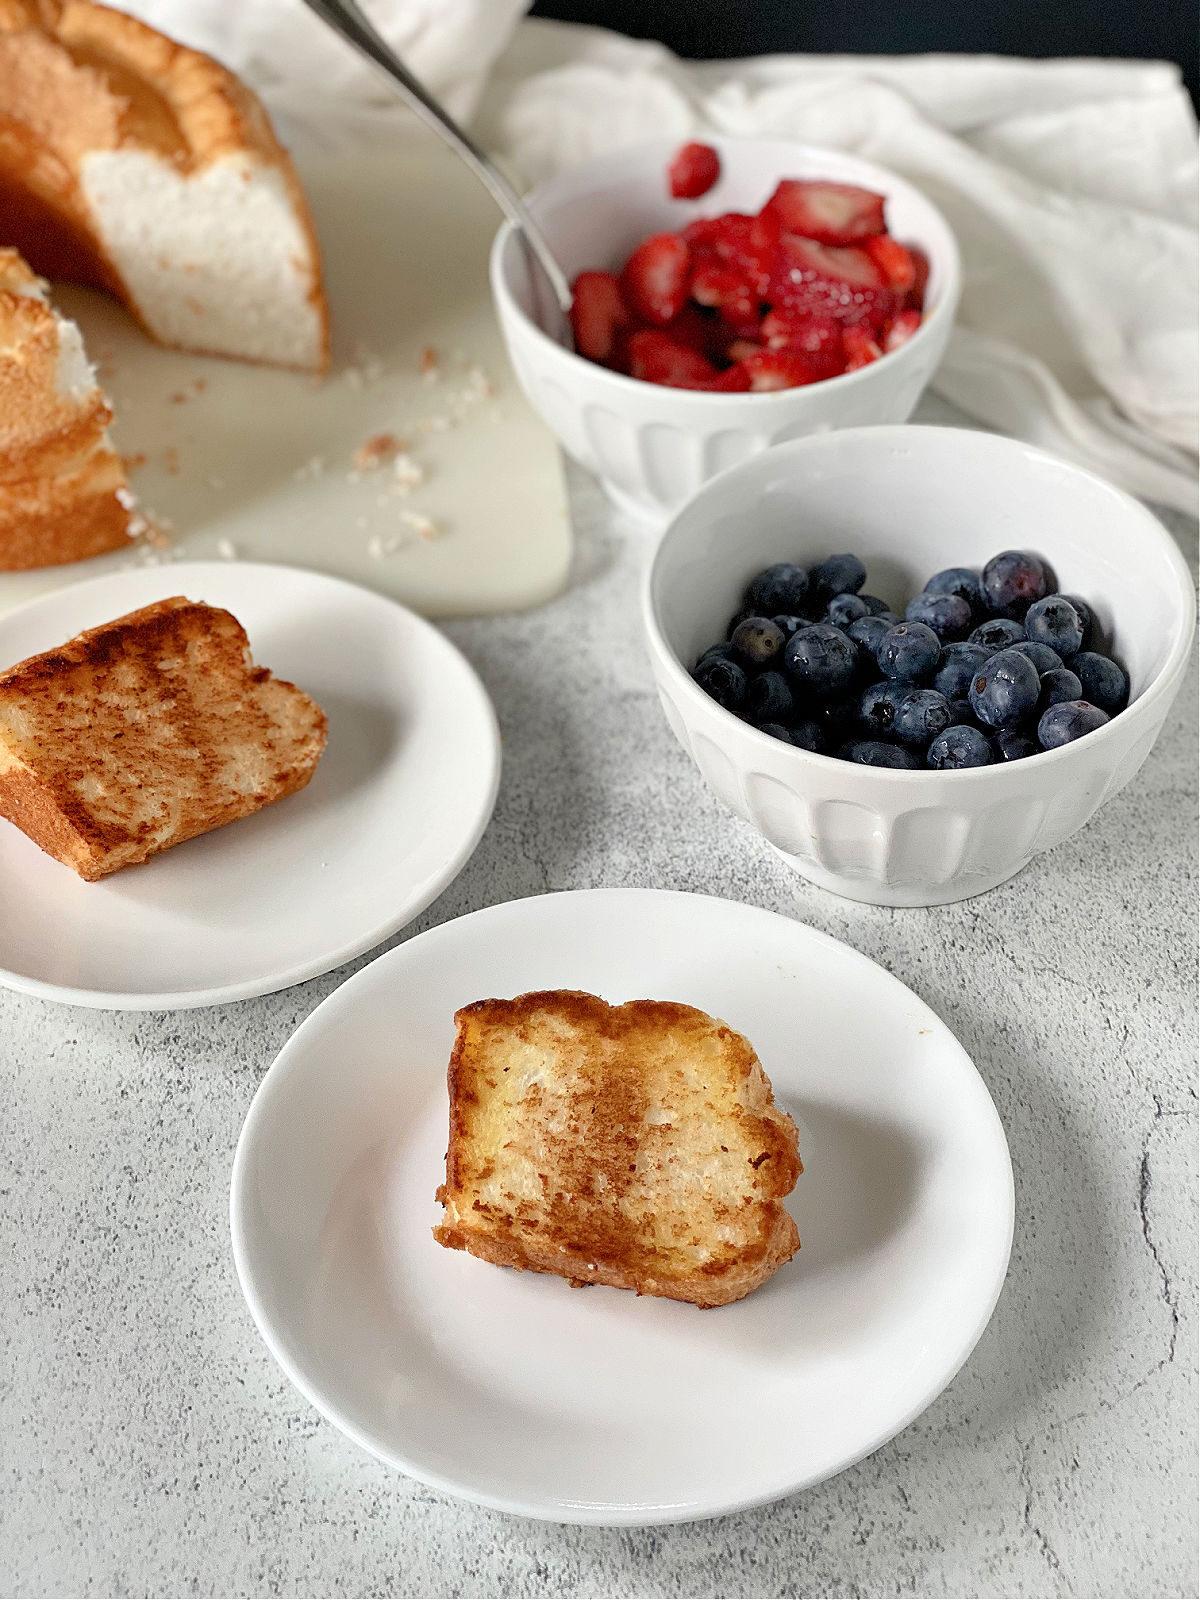 Plain toasted angel food cake on a white plate.